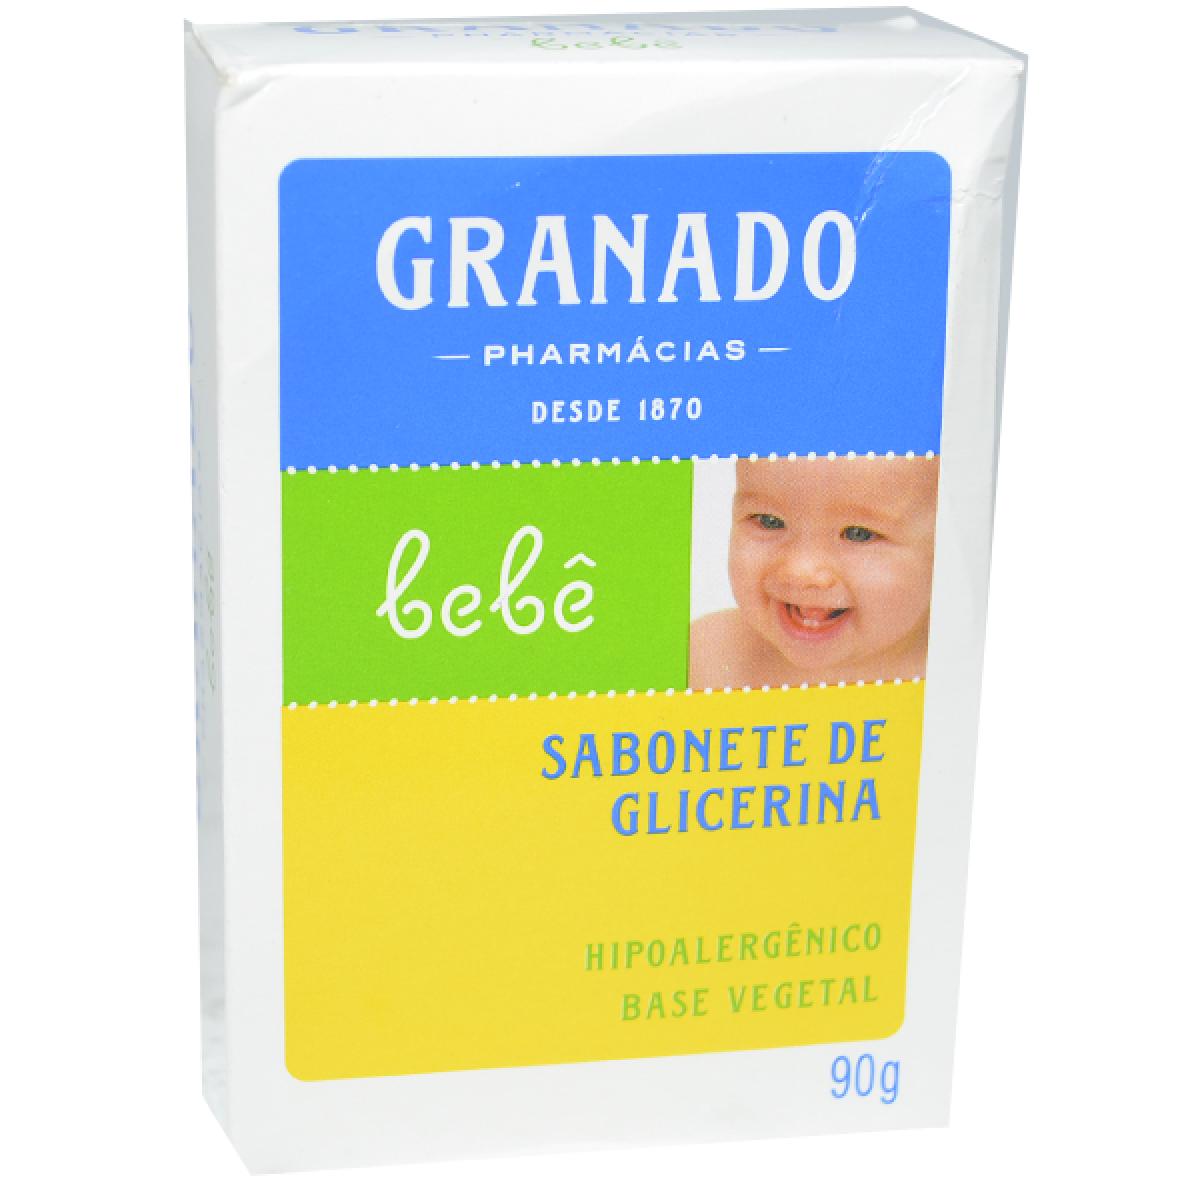 Sabonete Infantil Granado bebê de Glicerina 90g